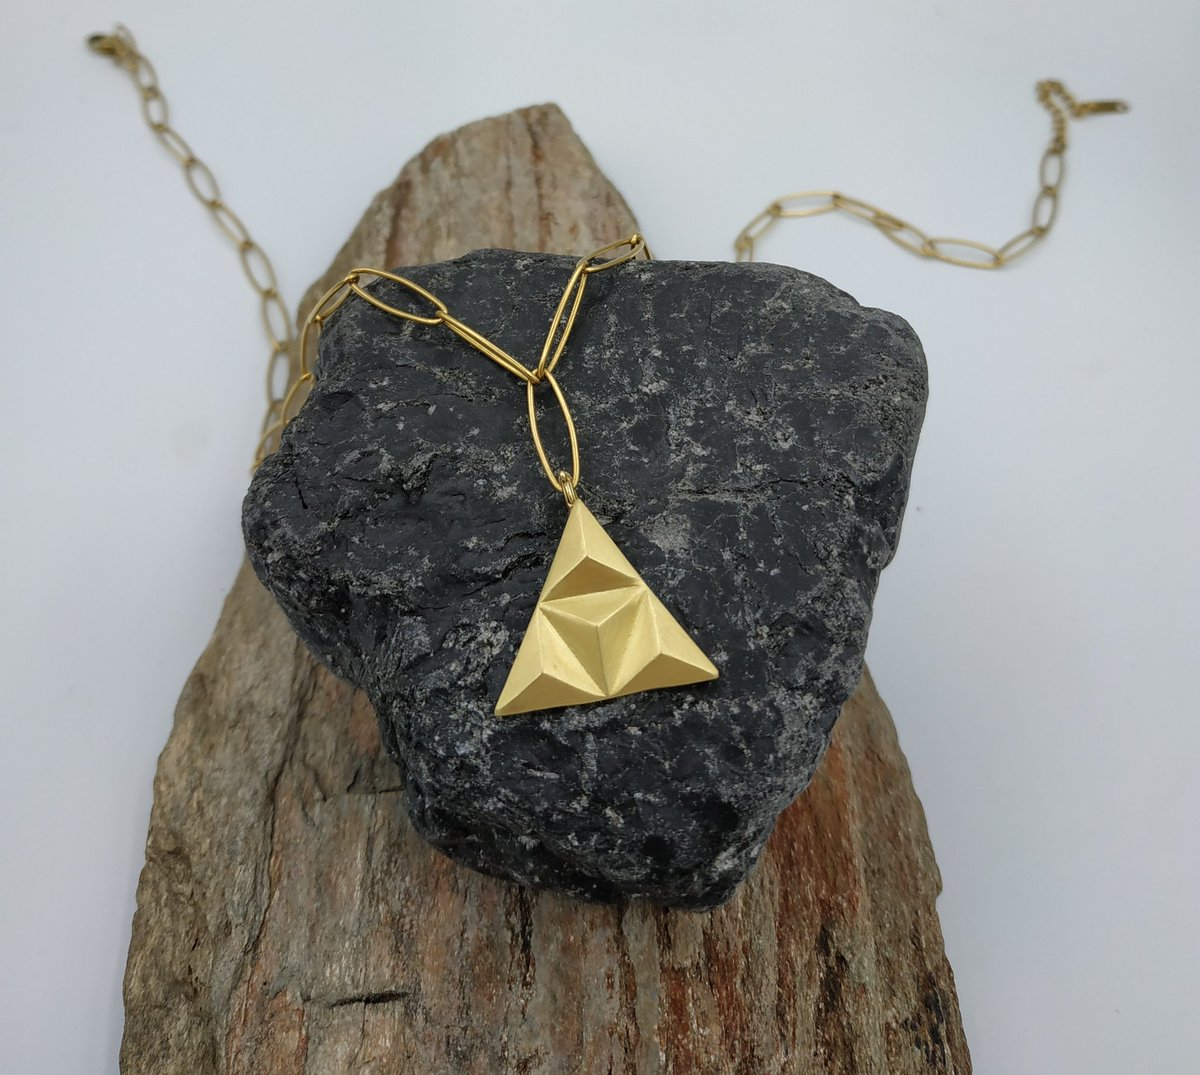 Gold triangle pendant, geometric design necklace #geometricjewelry #fashionjewelry #giftforher #contemporaryart #etsyshop  #trianglependant #goldtriangle https://t.co/jubK1vuzk5